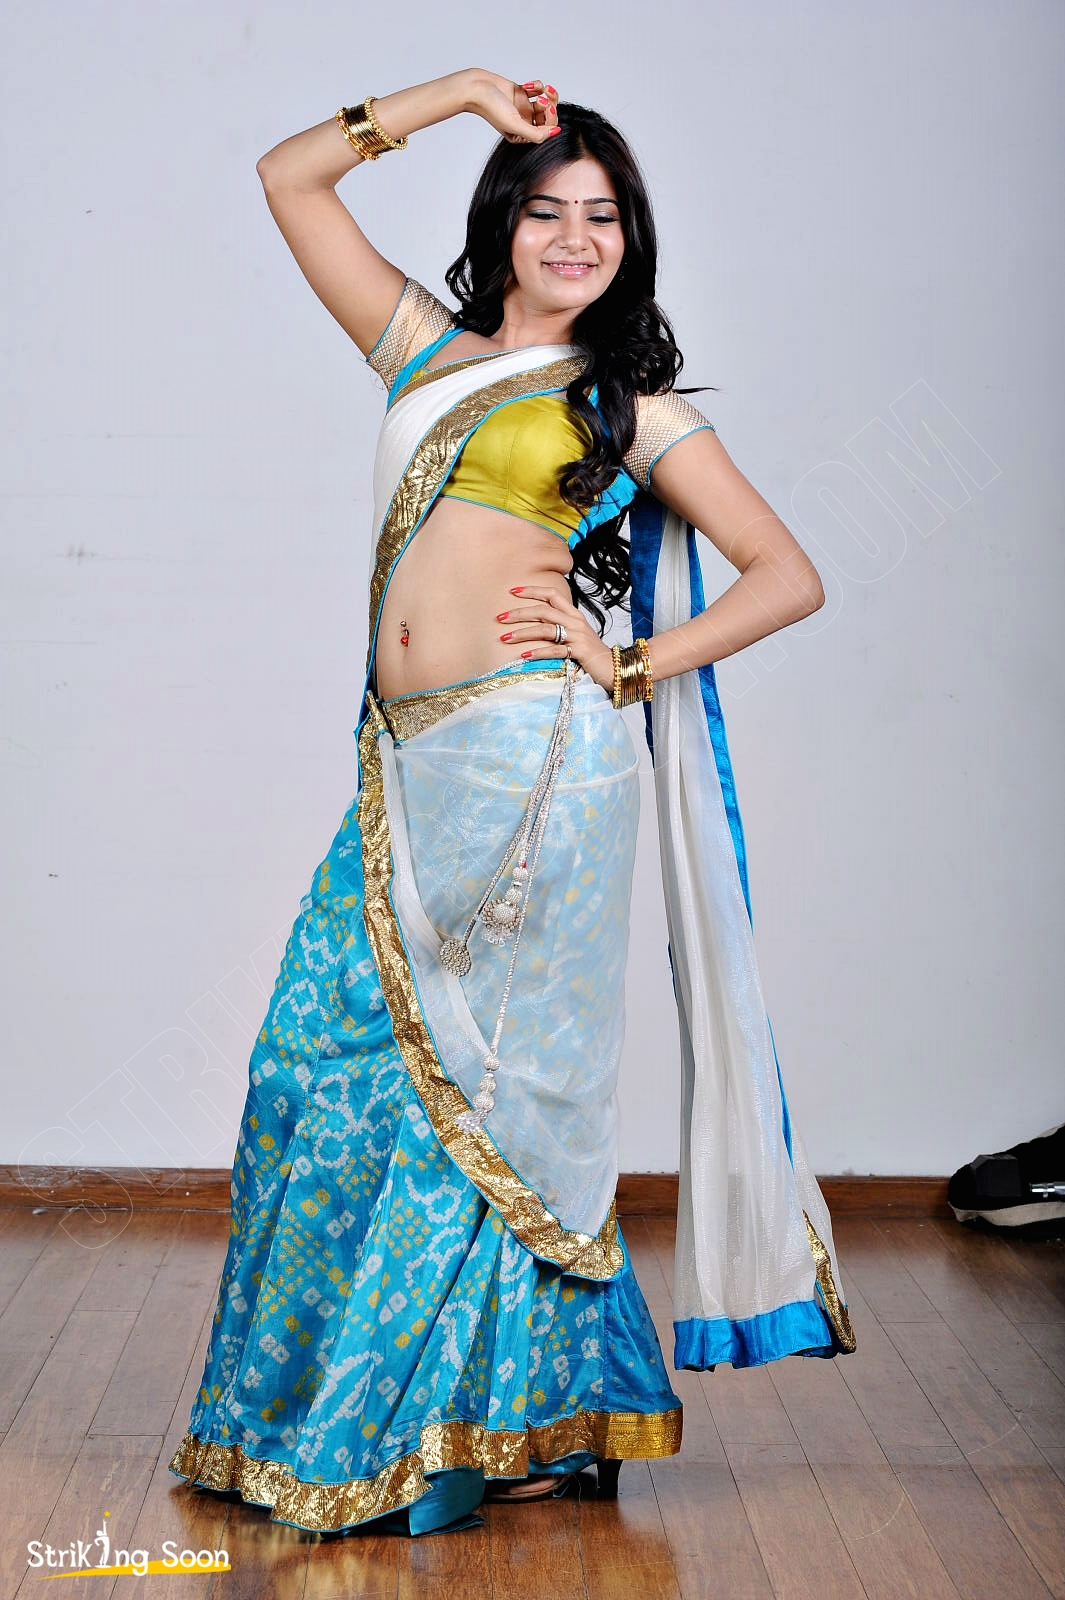 Samantha Hot Navel Show Photos Hd Images Strikingsoon Com